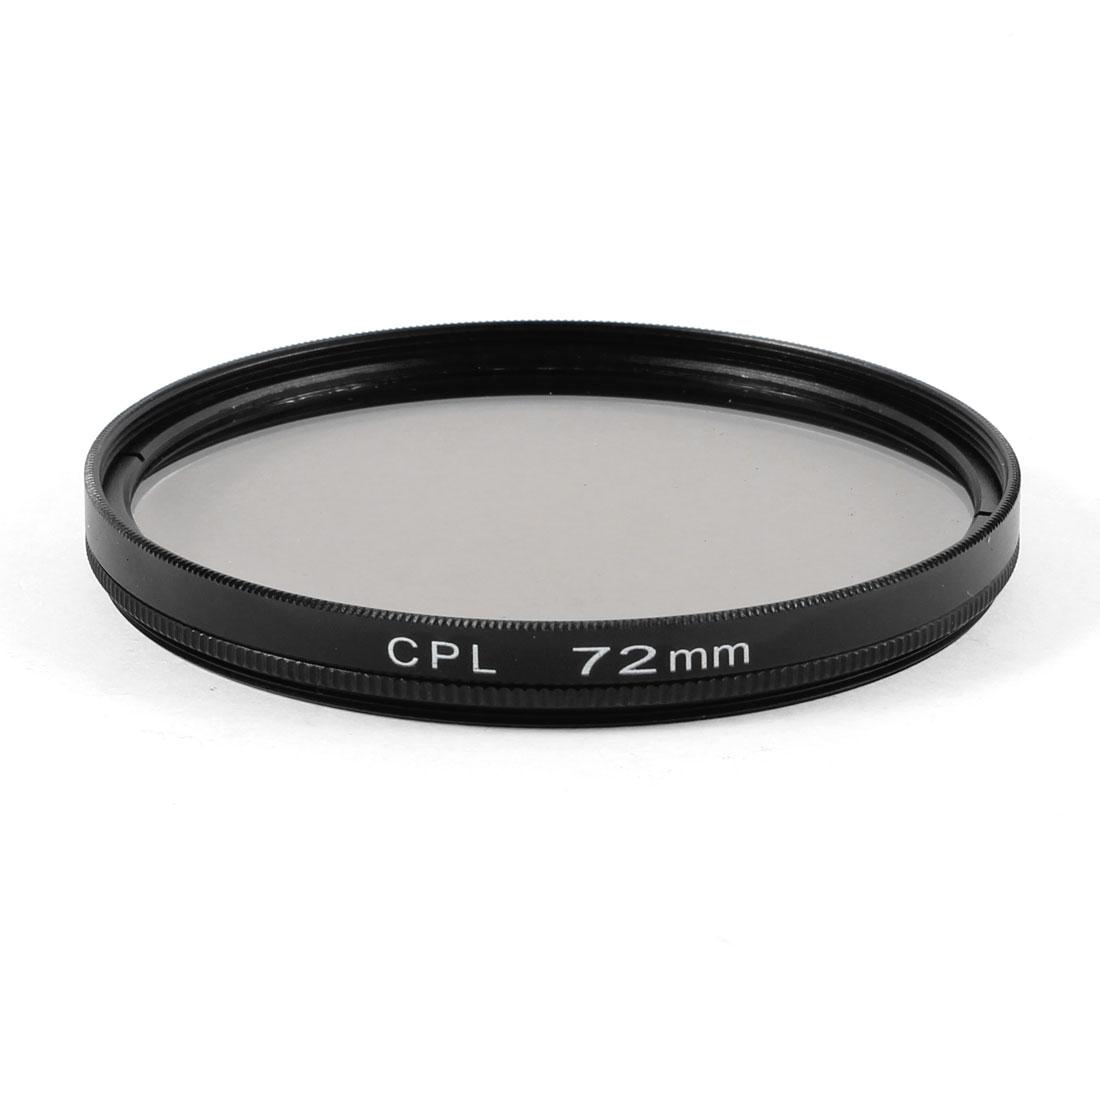 72mm Circular Polarizing CPL Lens Filter Protector Black for Digital Camera